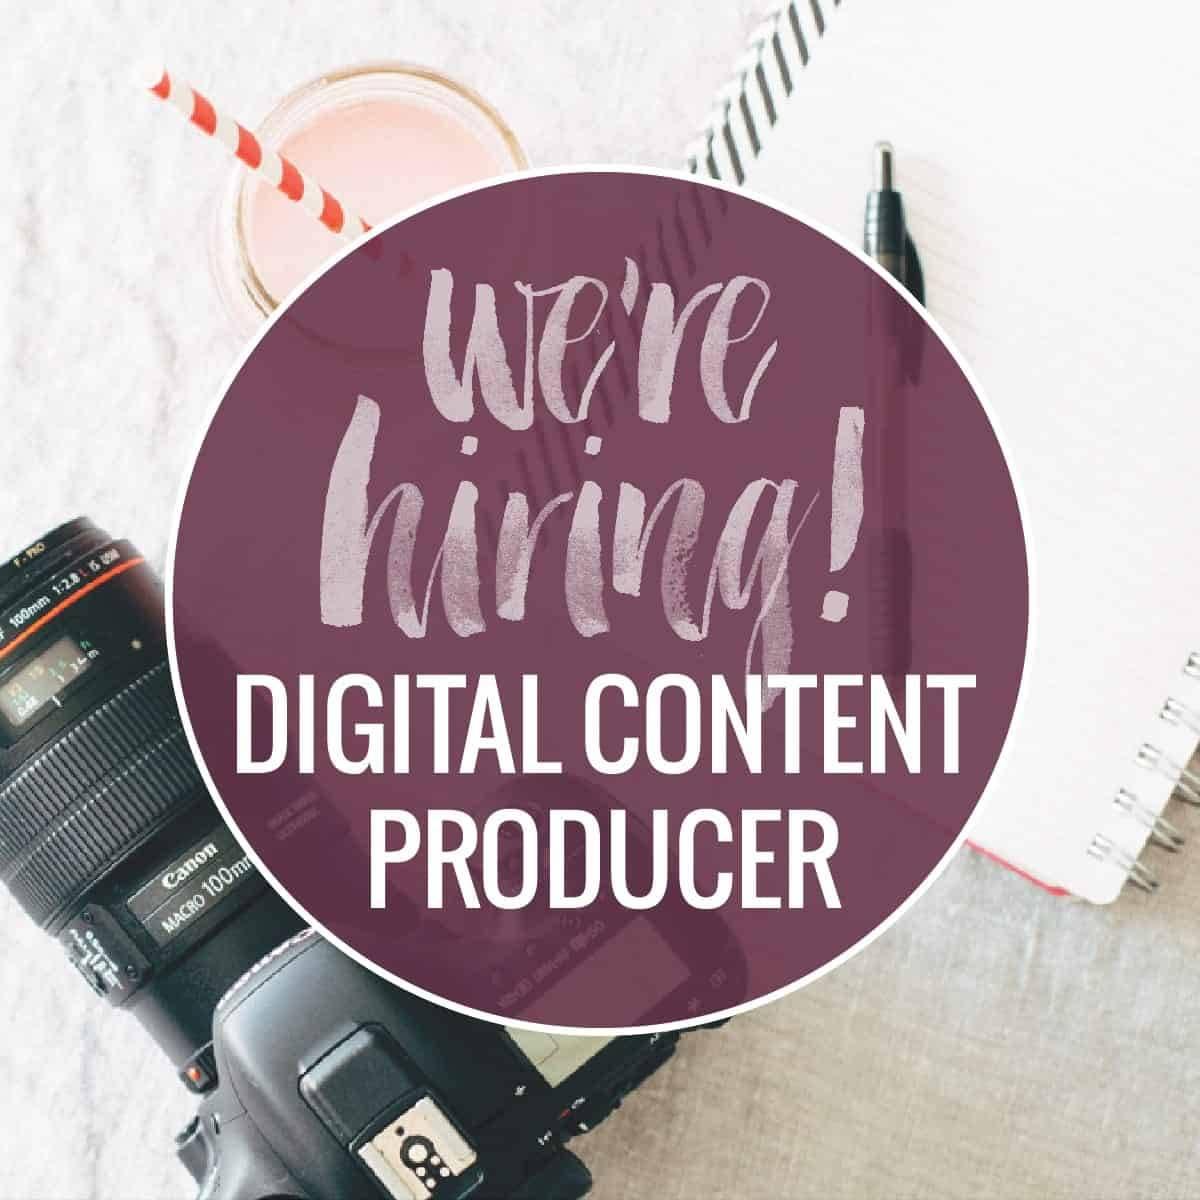 We're Hiring a Digital Content Producer